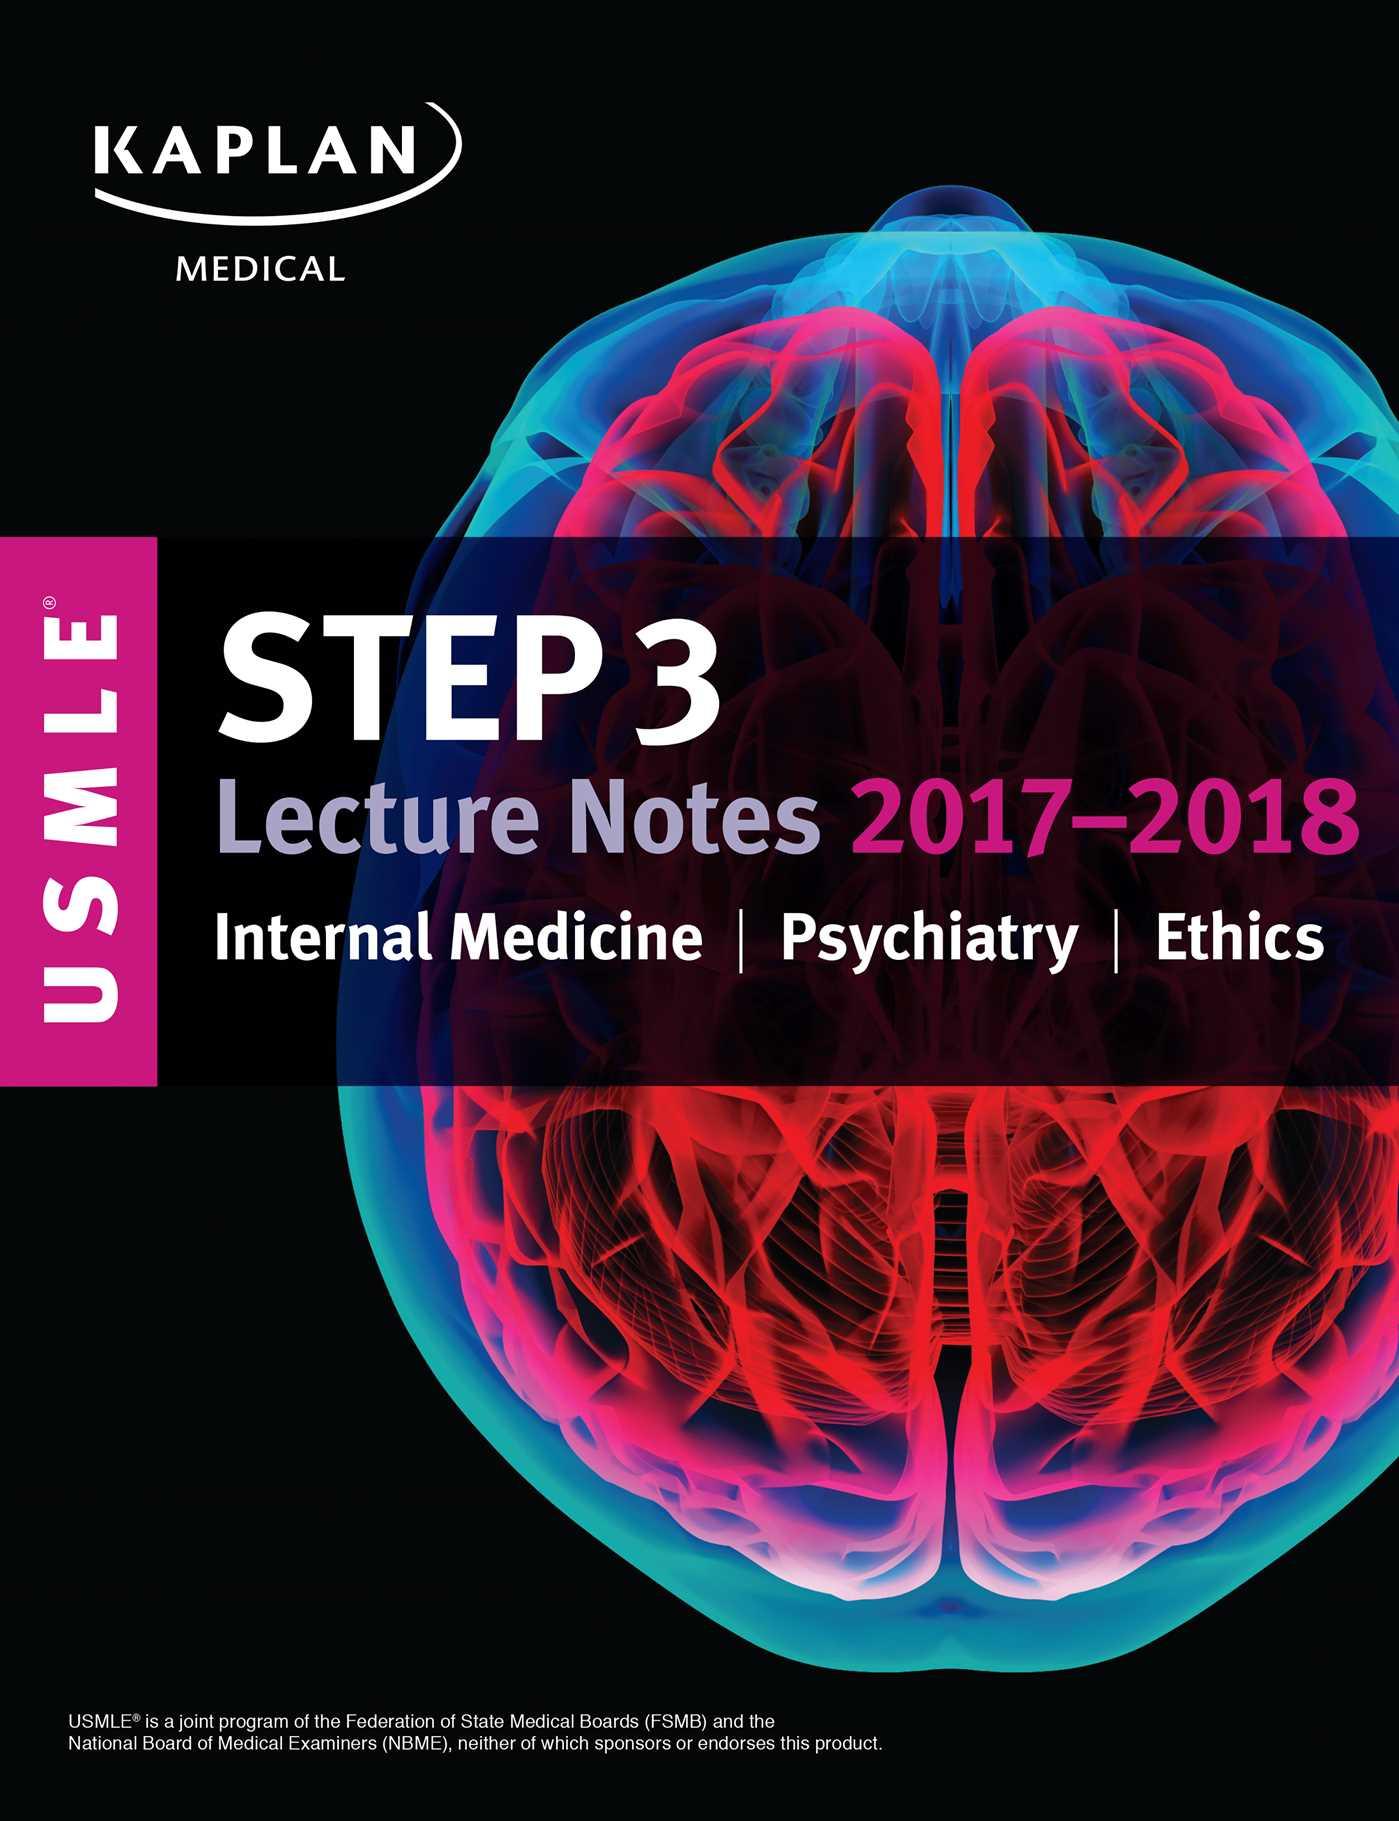 kaplan USMLE Step 3 lecture Notes 2017-2018